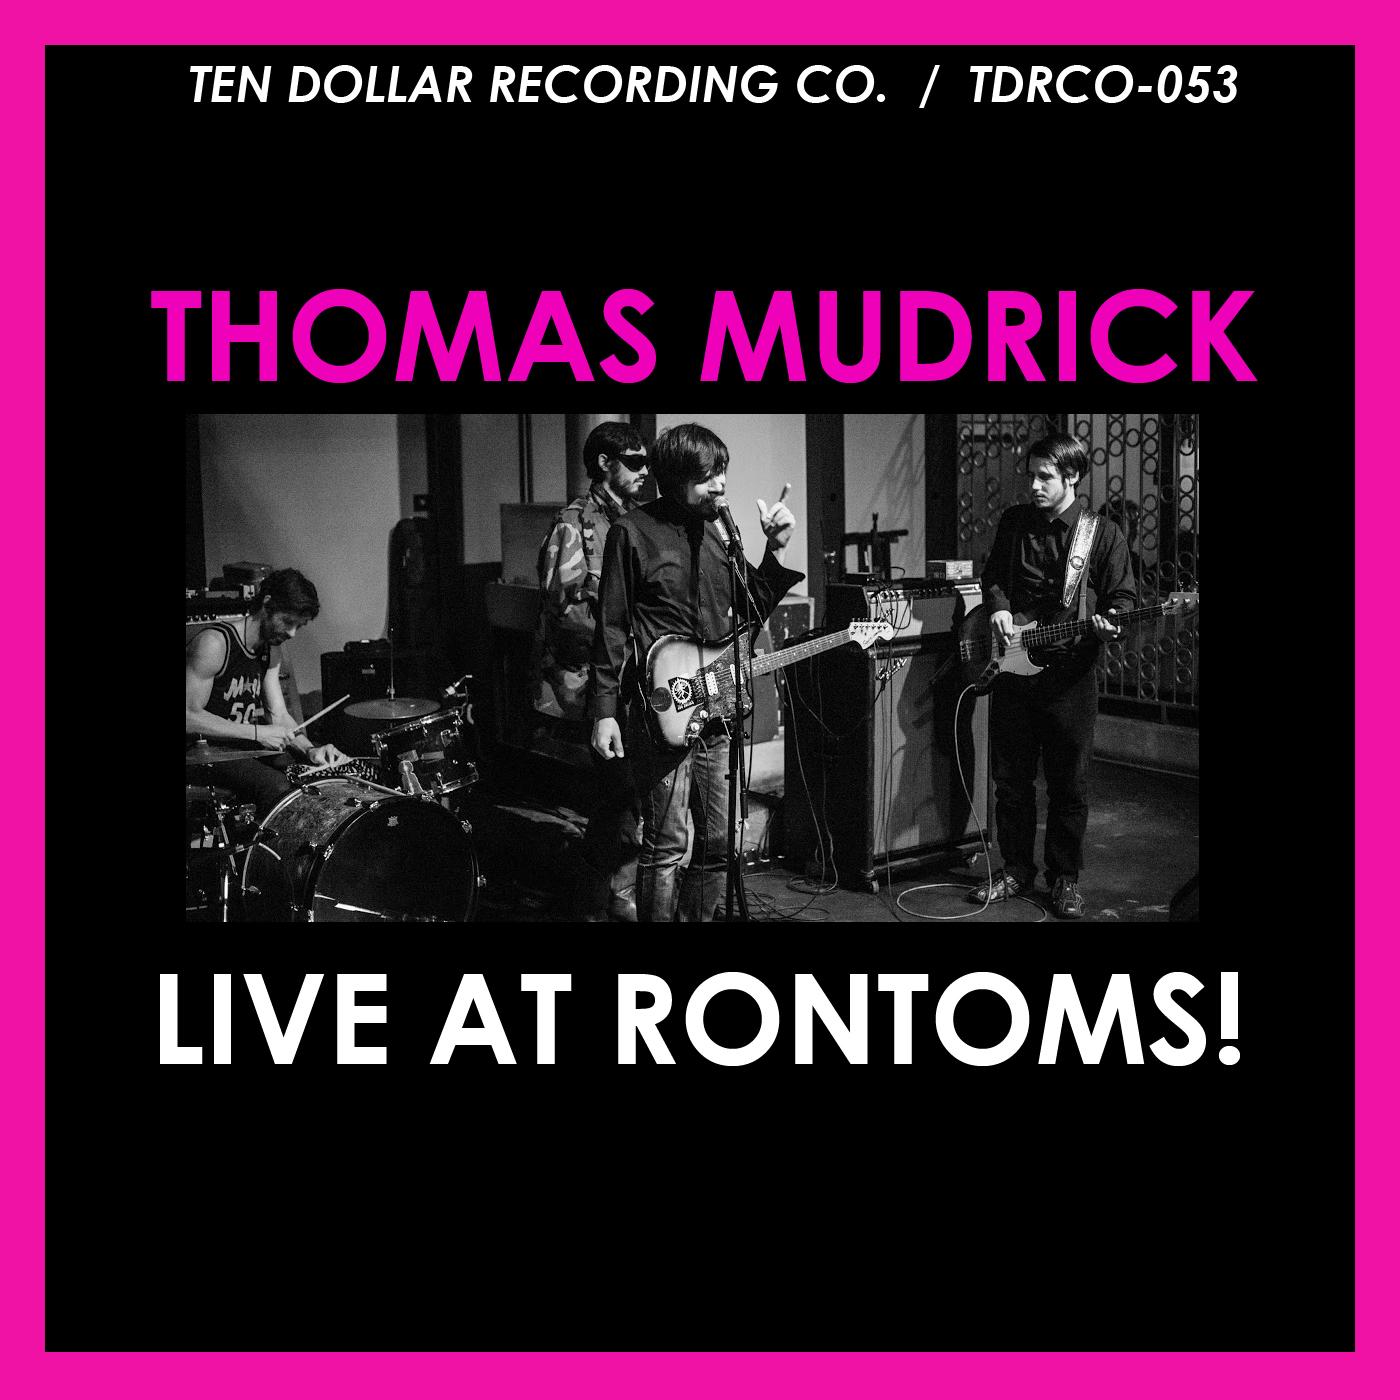 Thomas Mudrick - Live at Rontoms!